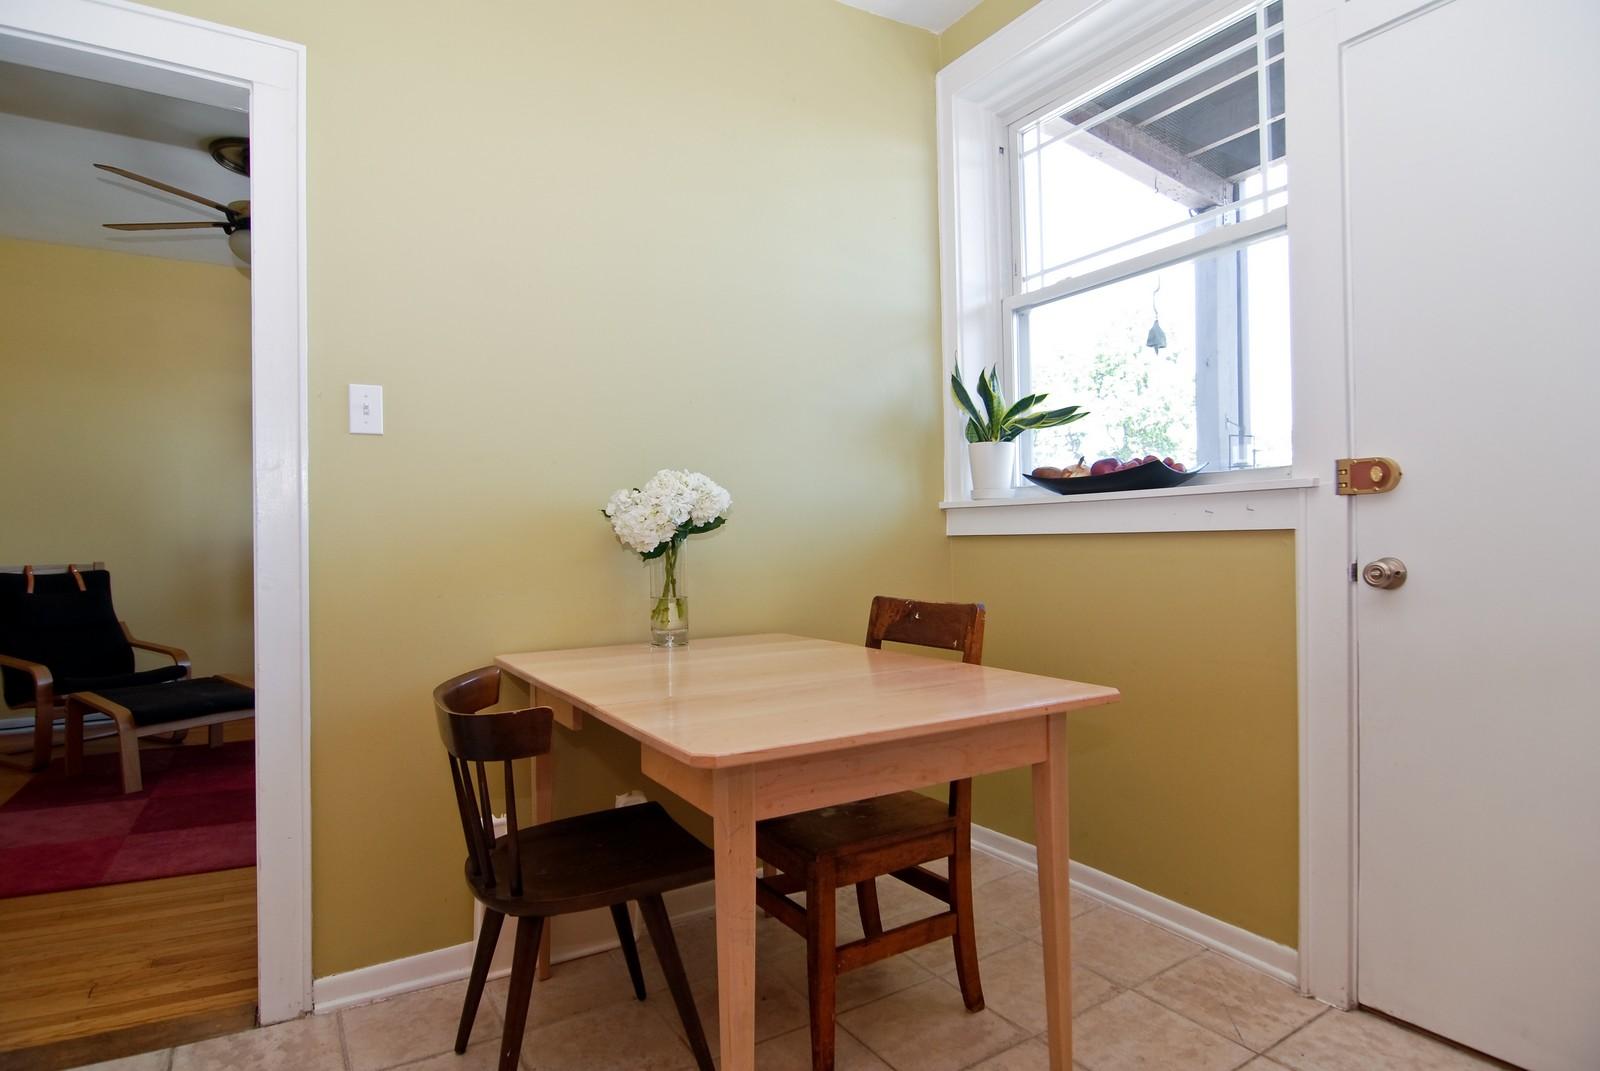 Real Estate Photography - 2658 W. Altgeld #3, Chicago, IL, 60647 - Kitchen